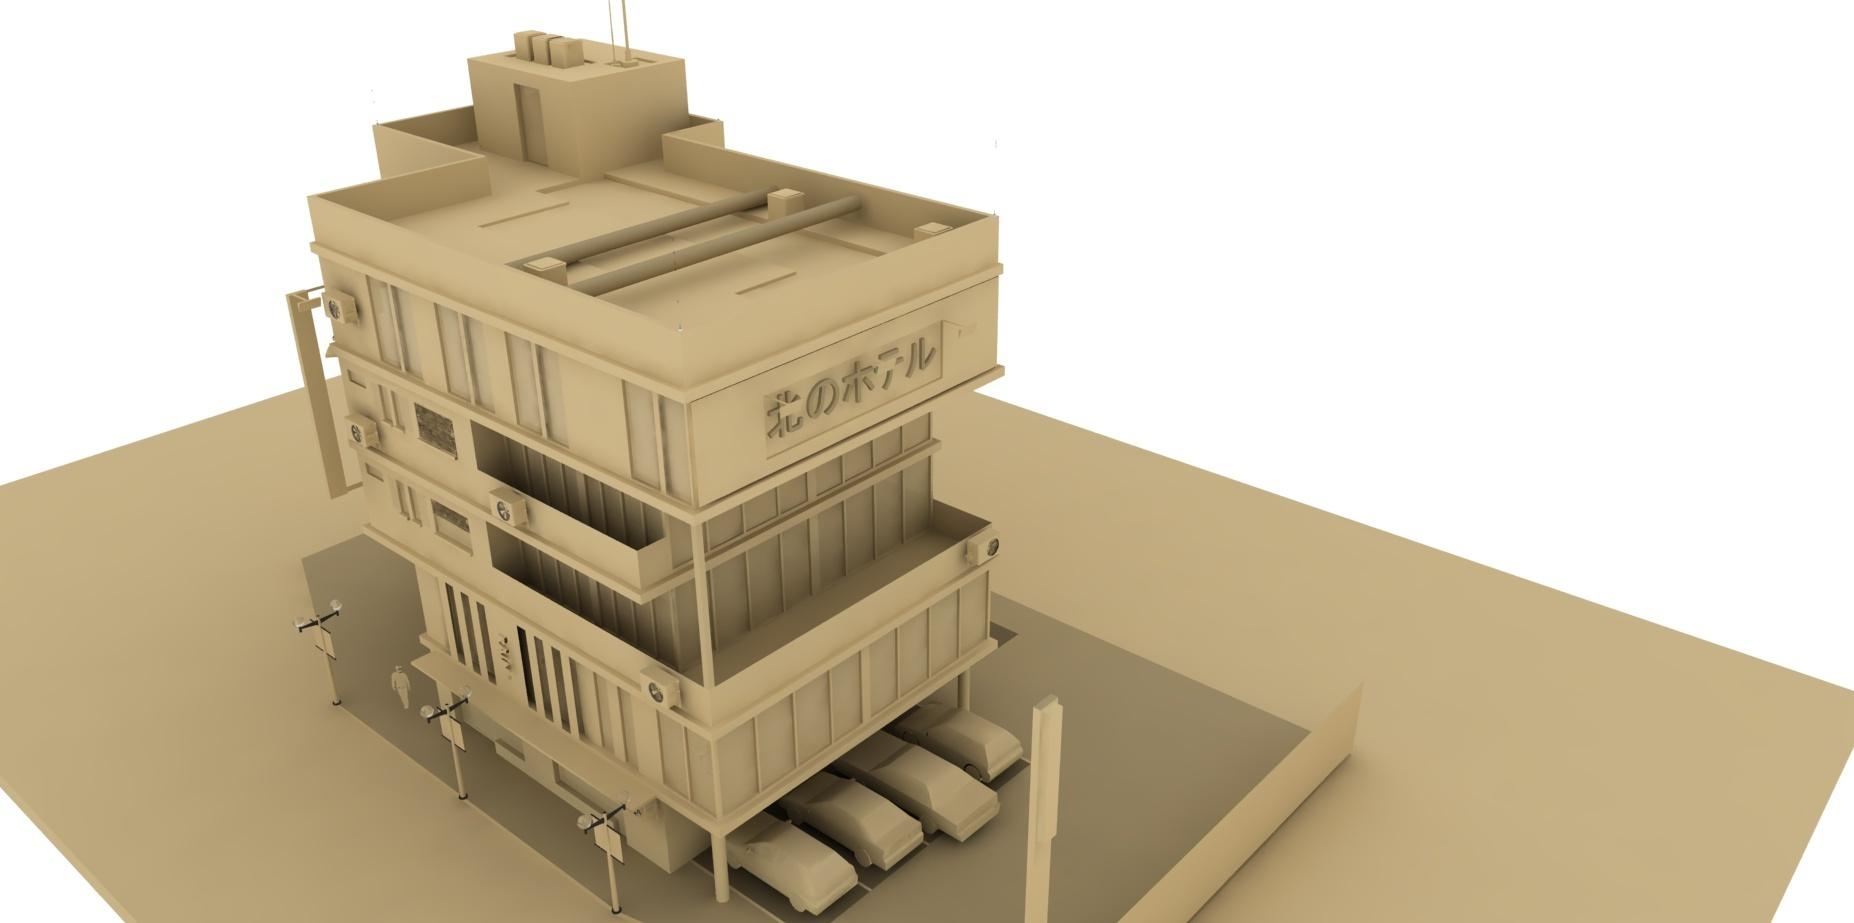 SketchUp'eur architecte -AnthO'- - Page 4 Hot210